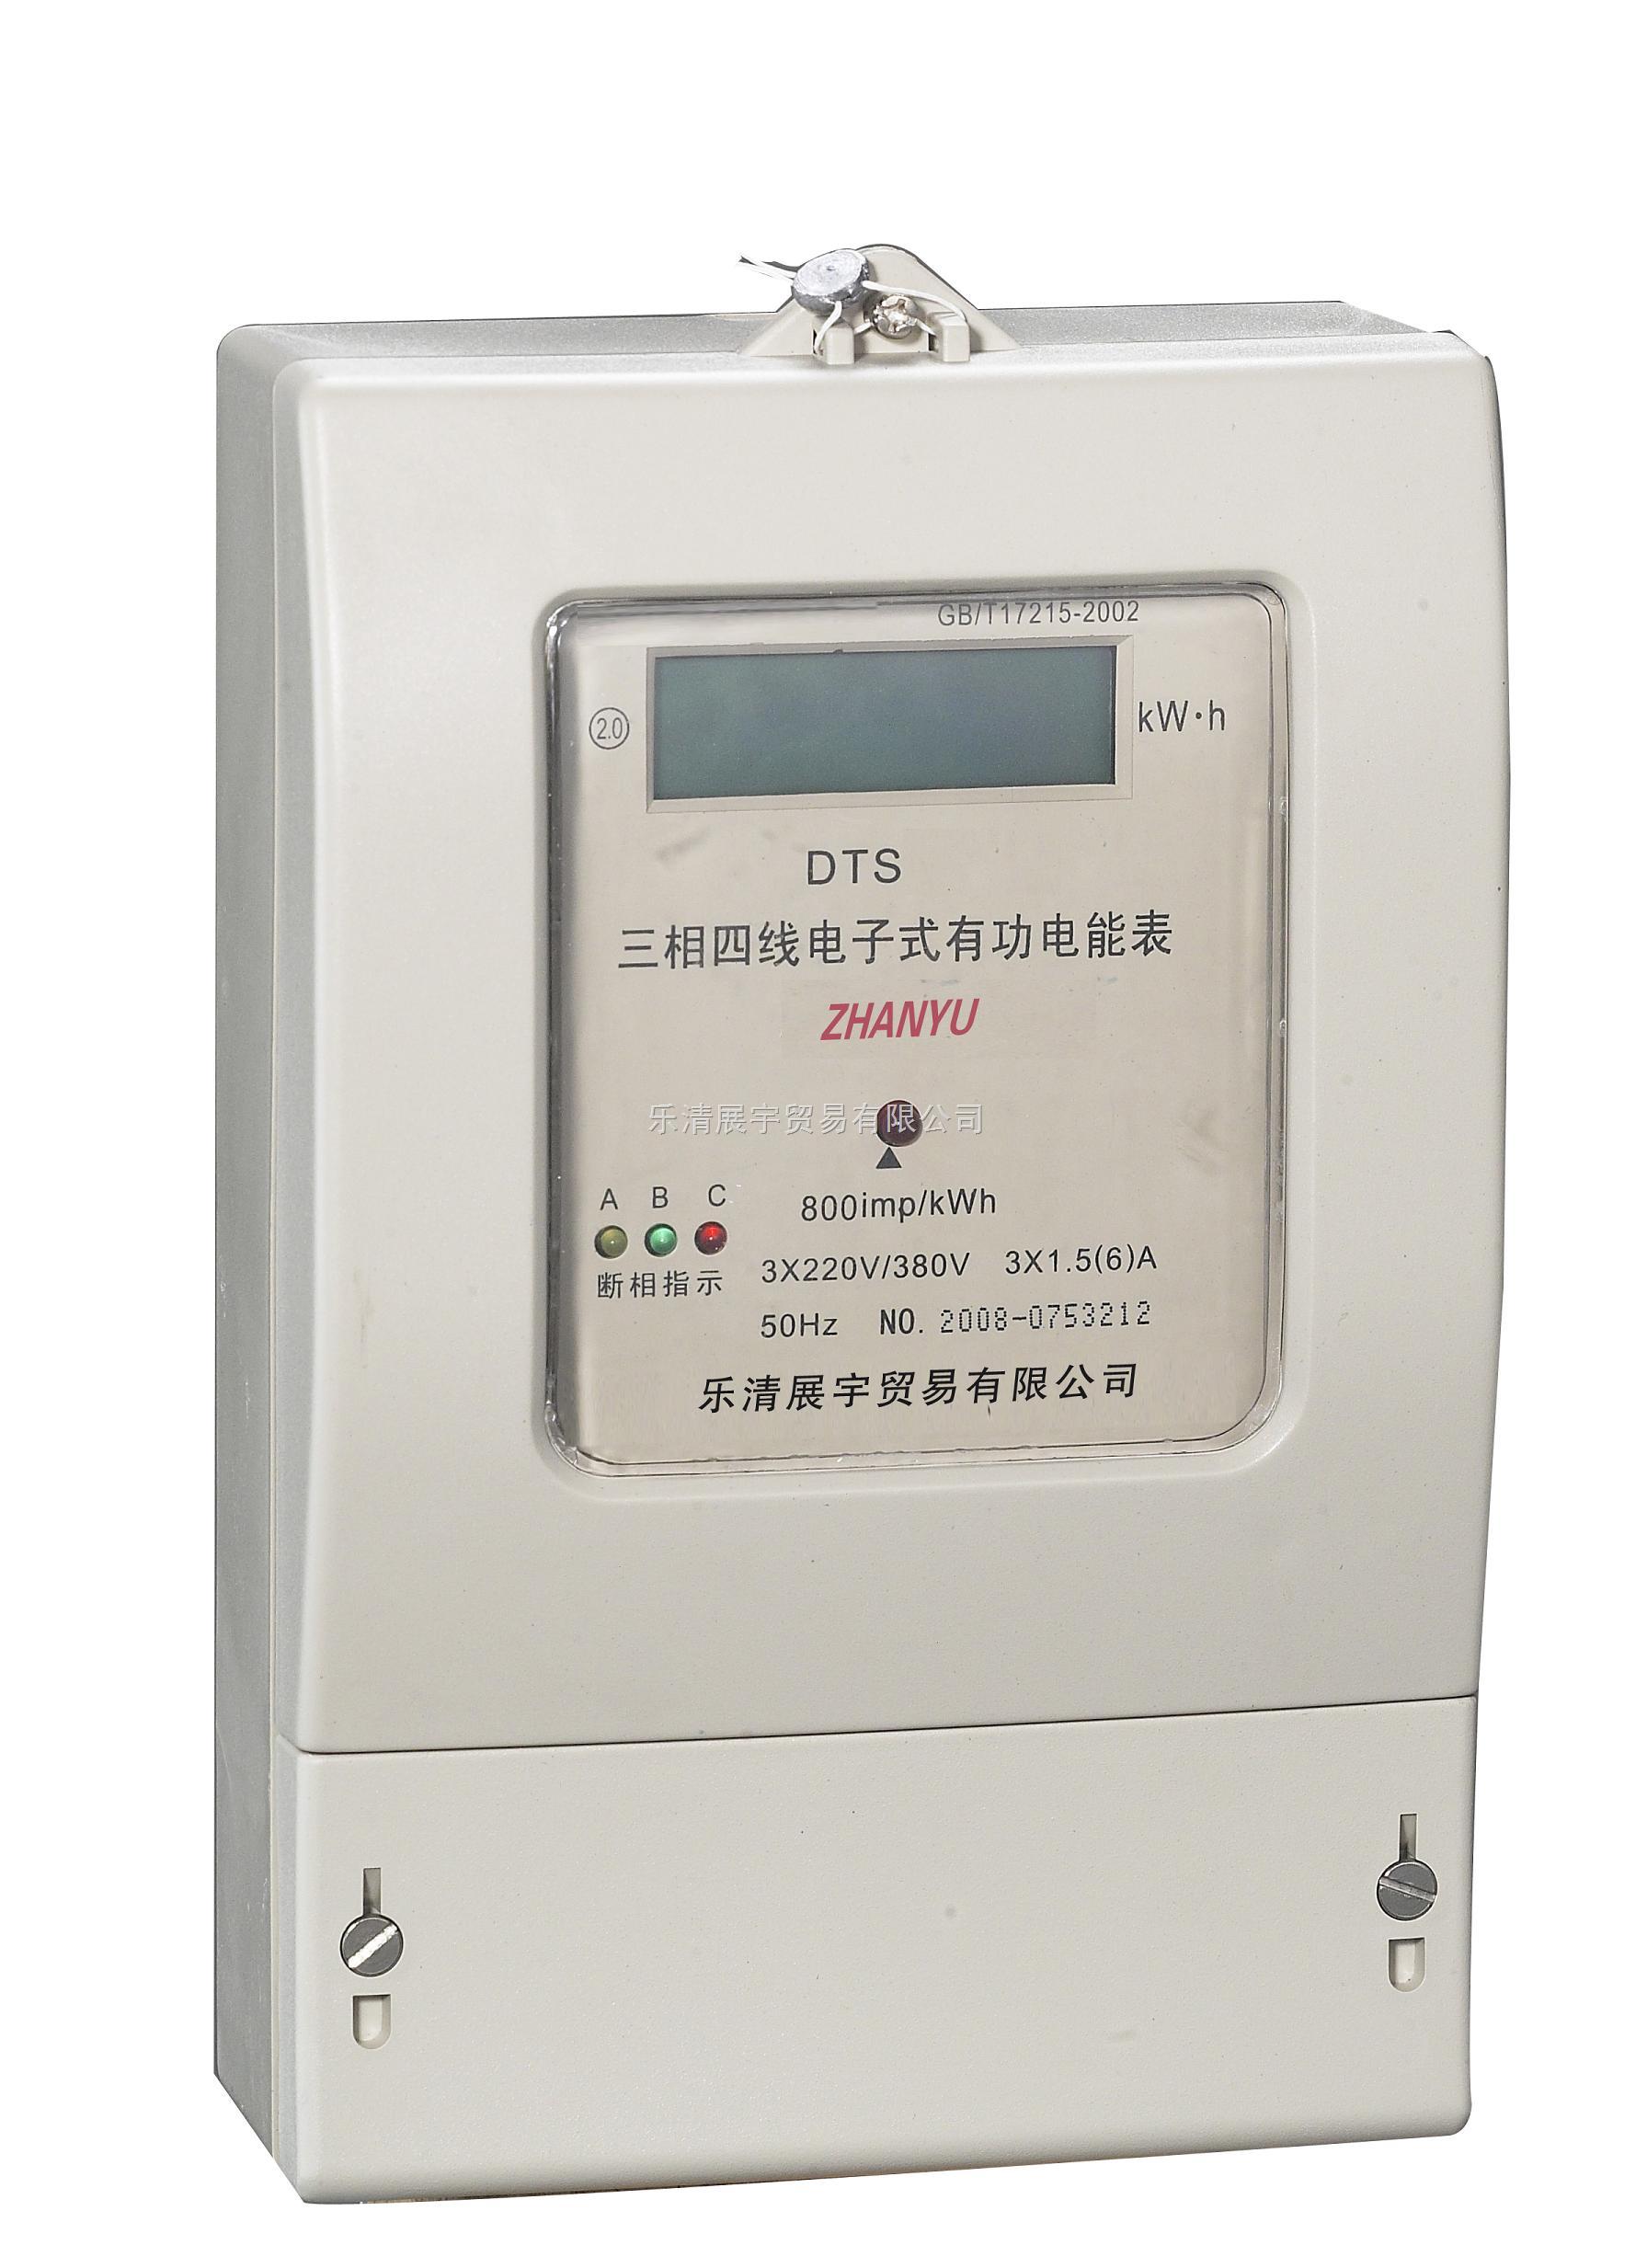 dts/dss三相四线电子式电能表